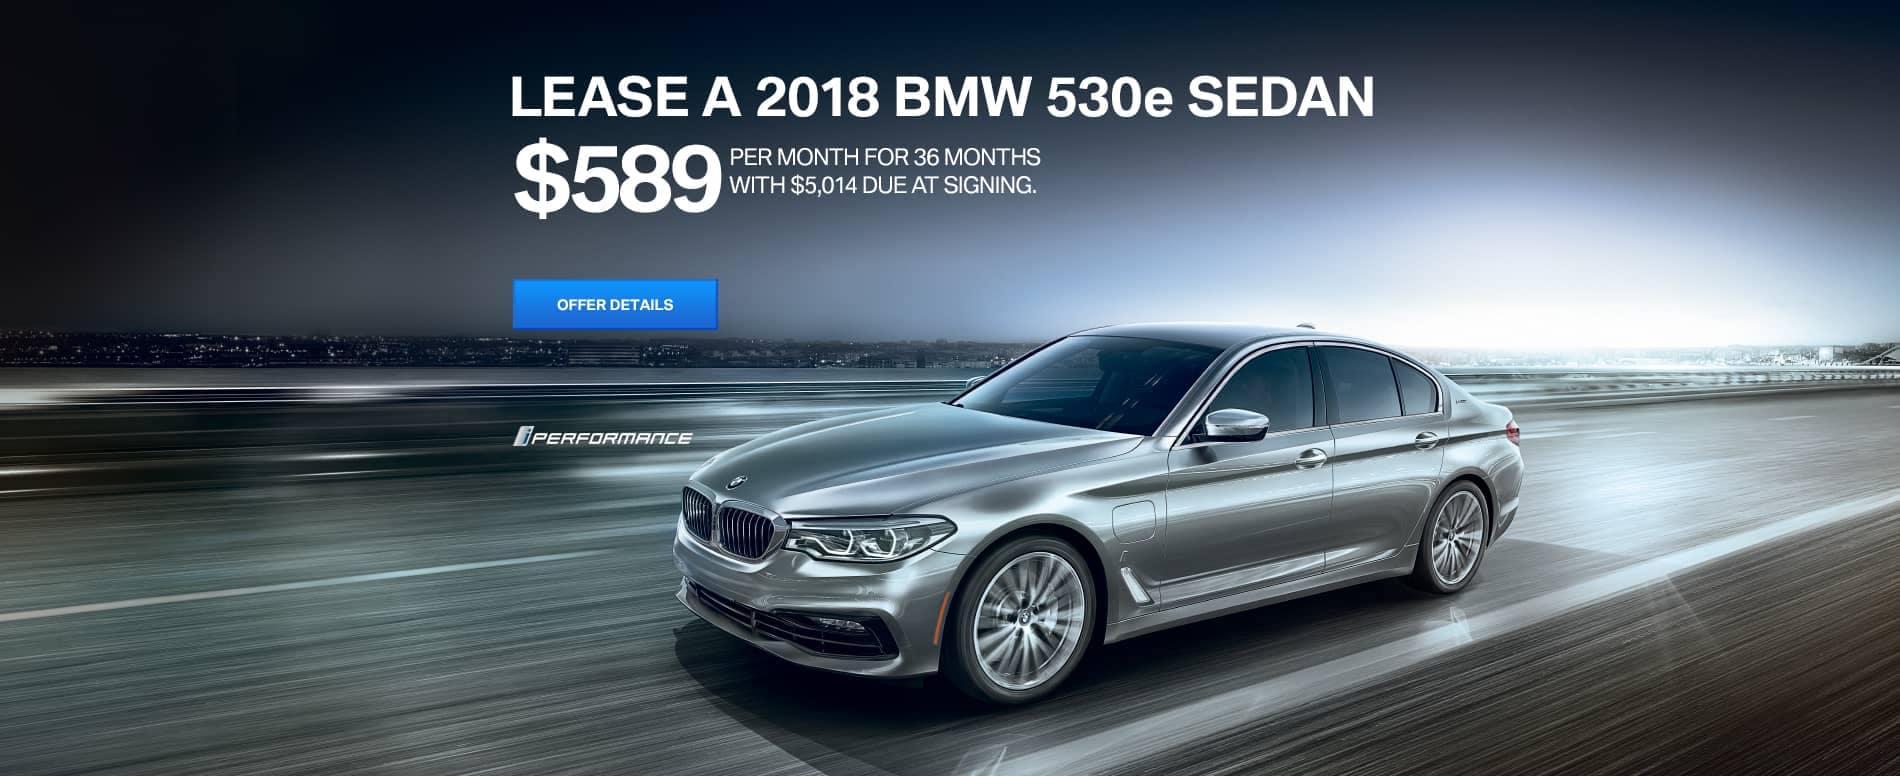 2018_530e_Performance_Sedan_NATIONAL_LEASE_$589